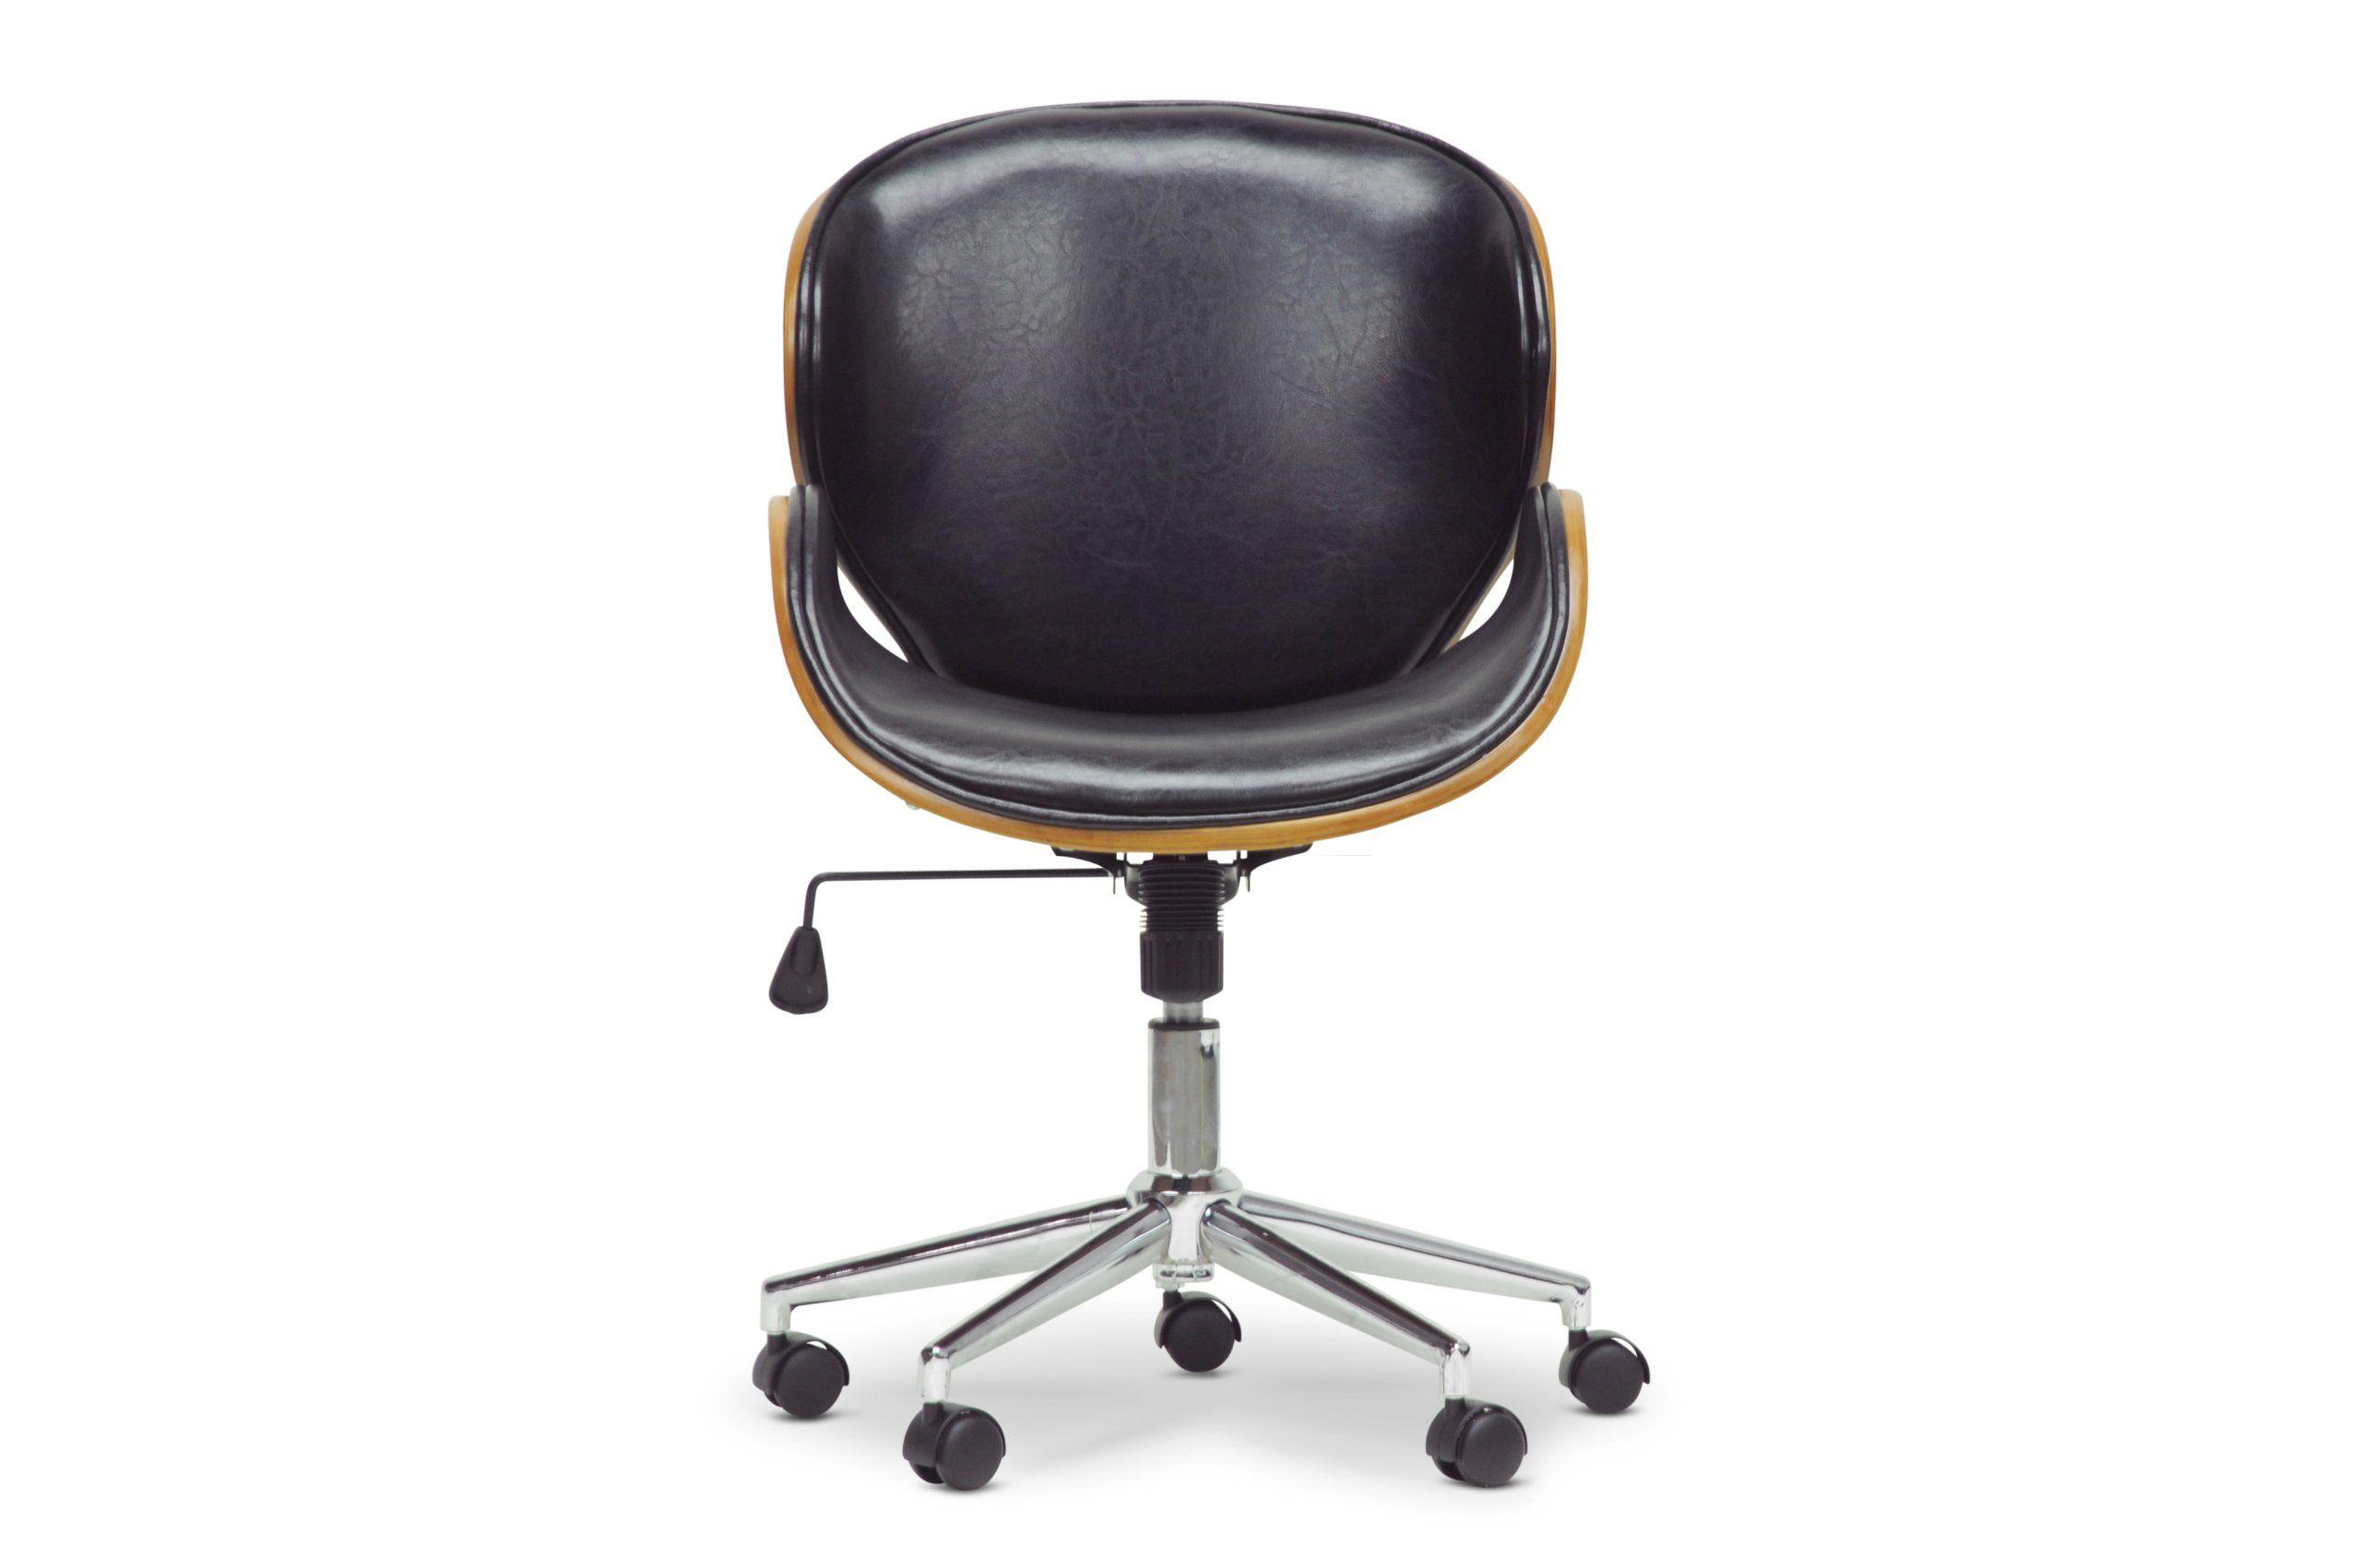 Baxton studio bruce modern office chair walnutblack